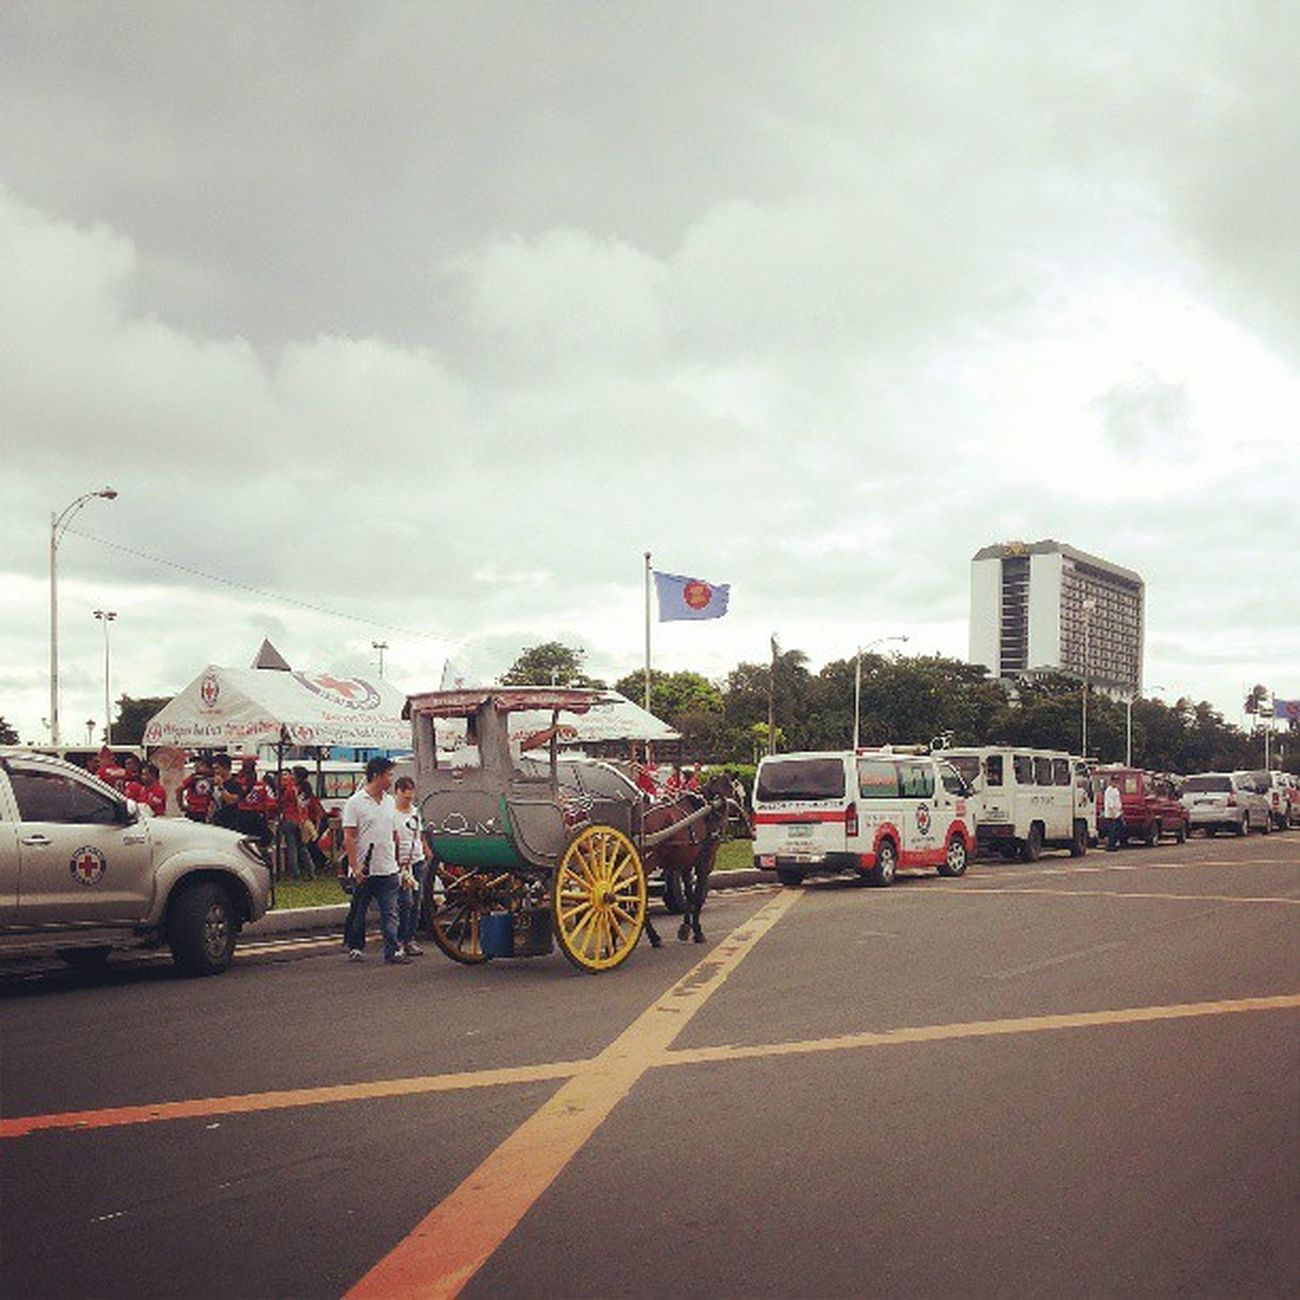 MillionPeopleMarch Luneta Manila Itsmorefuninthephilippines themanansala photography